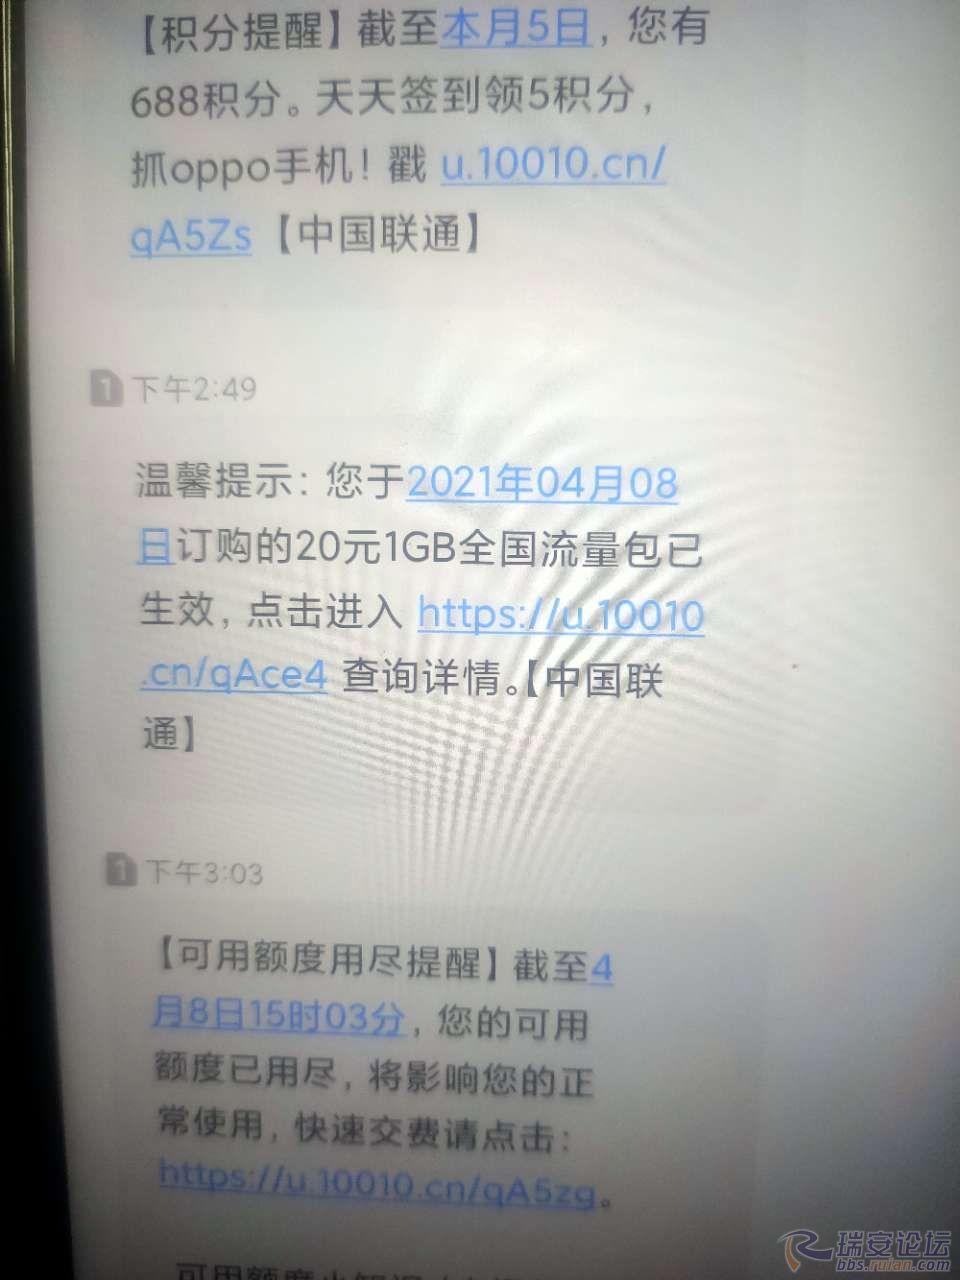 front2_0_FqYPJJtI5_qN_fp--kyYowcyd_JI.1617869593.jpg